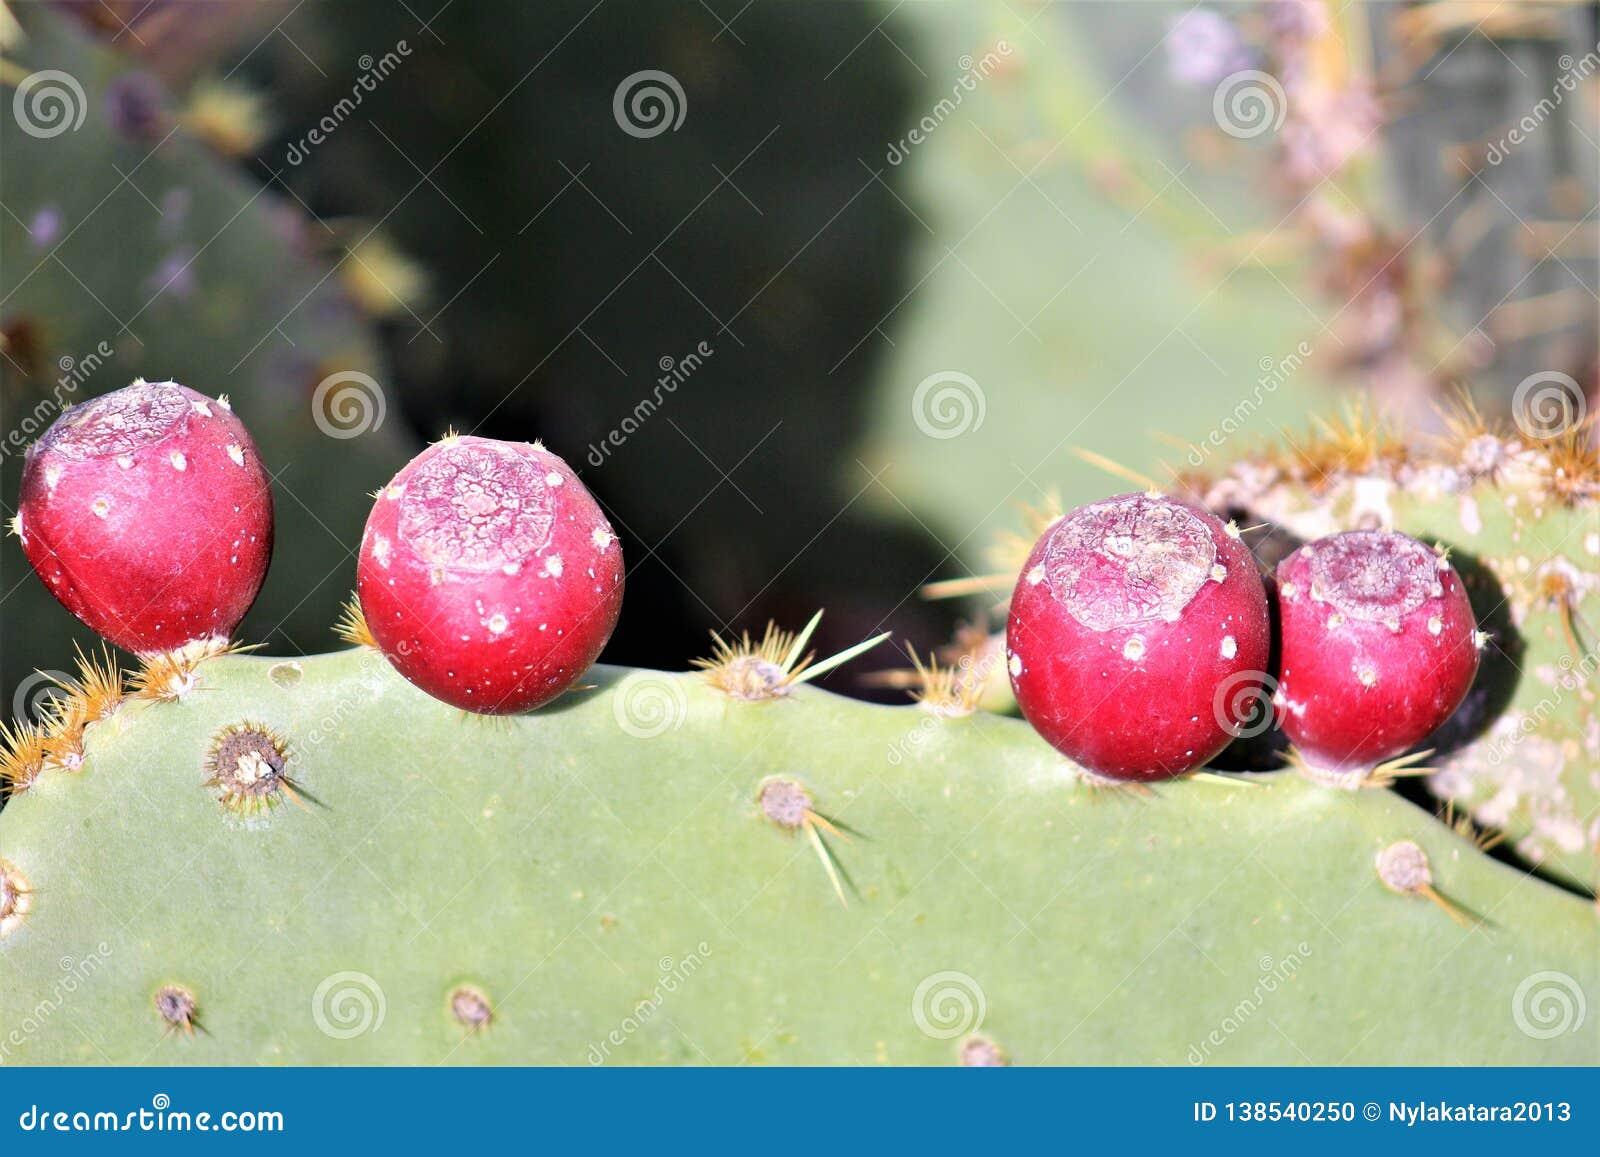 Desert Botanical Garden Phoenix, Arizona, United States